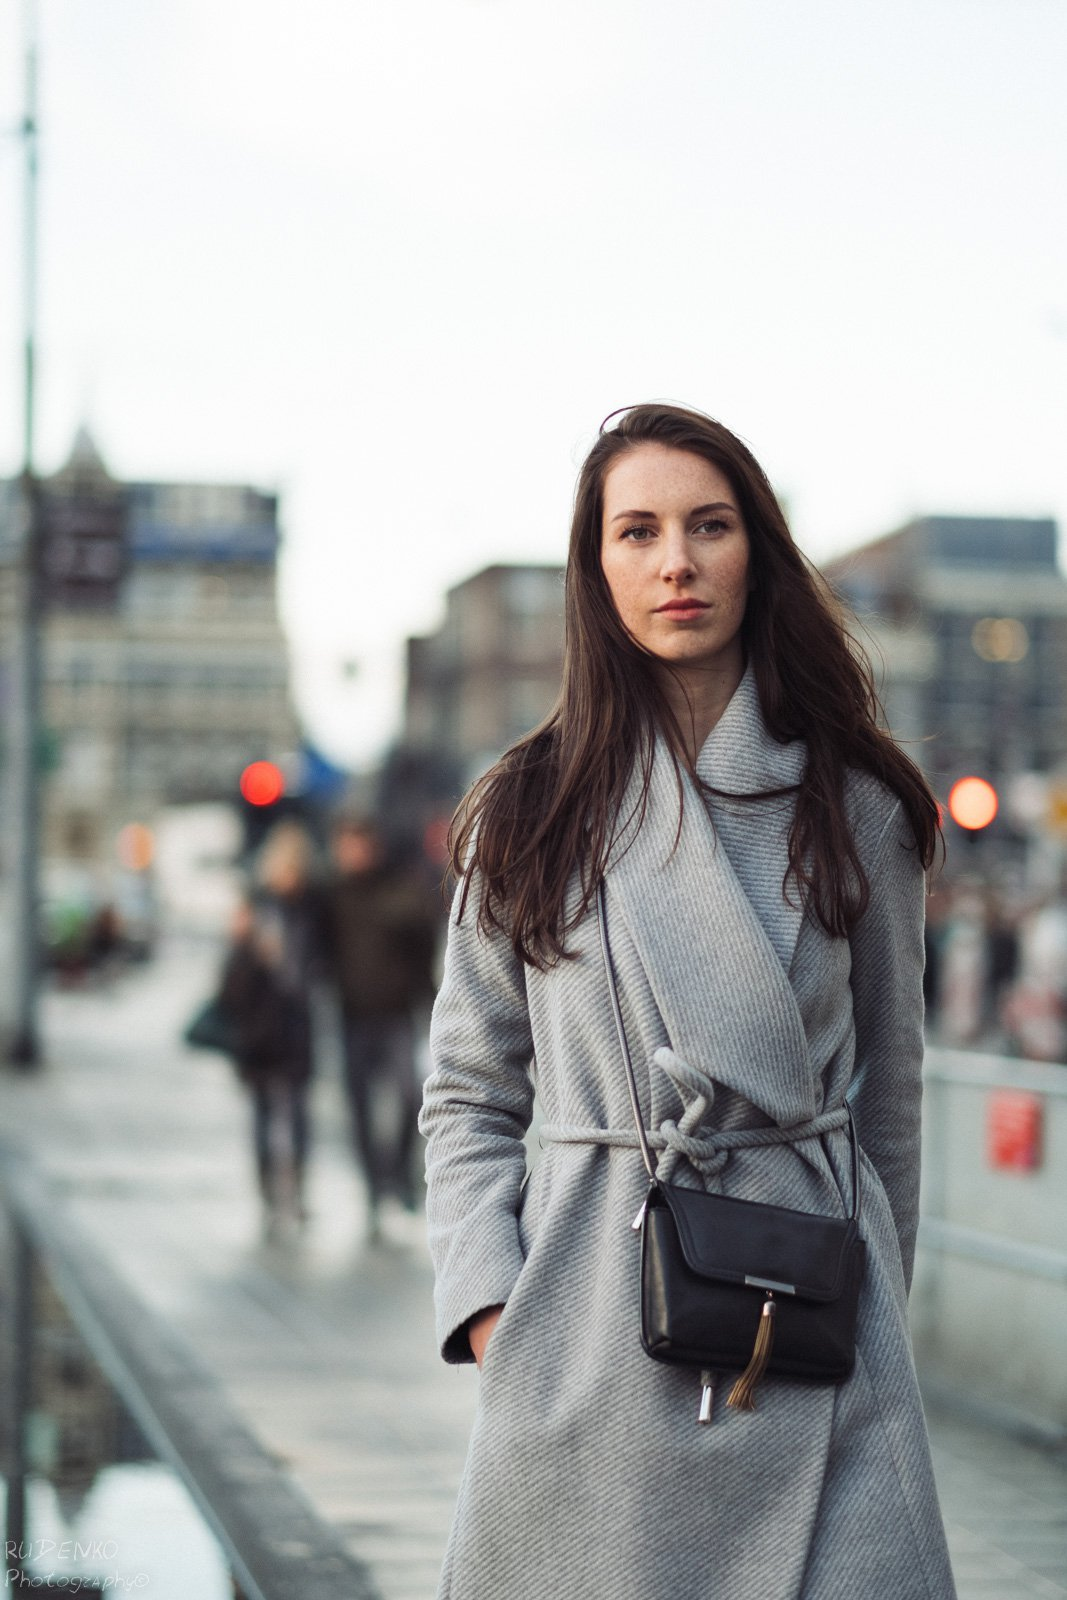 фотопрогулка девушки с амстердамским фотографом